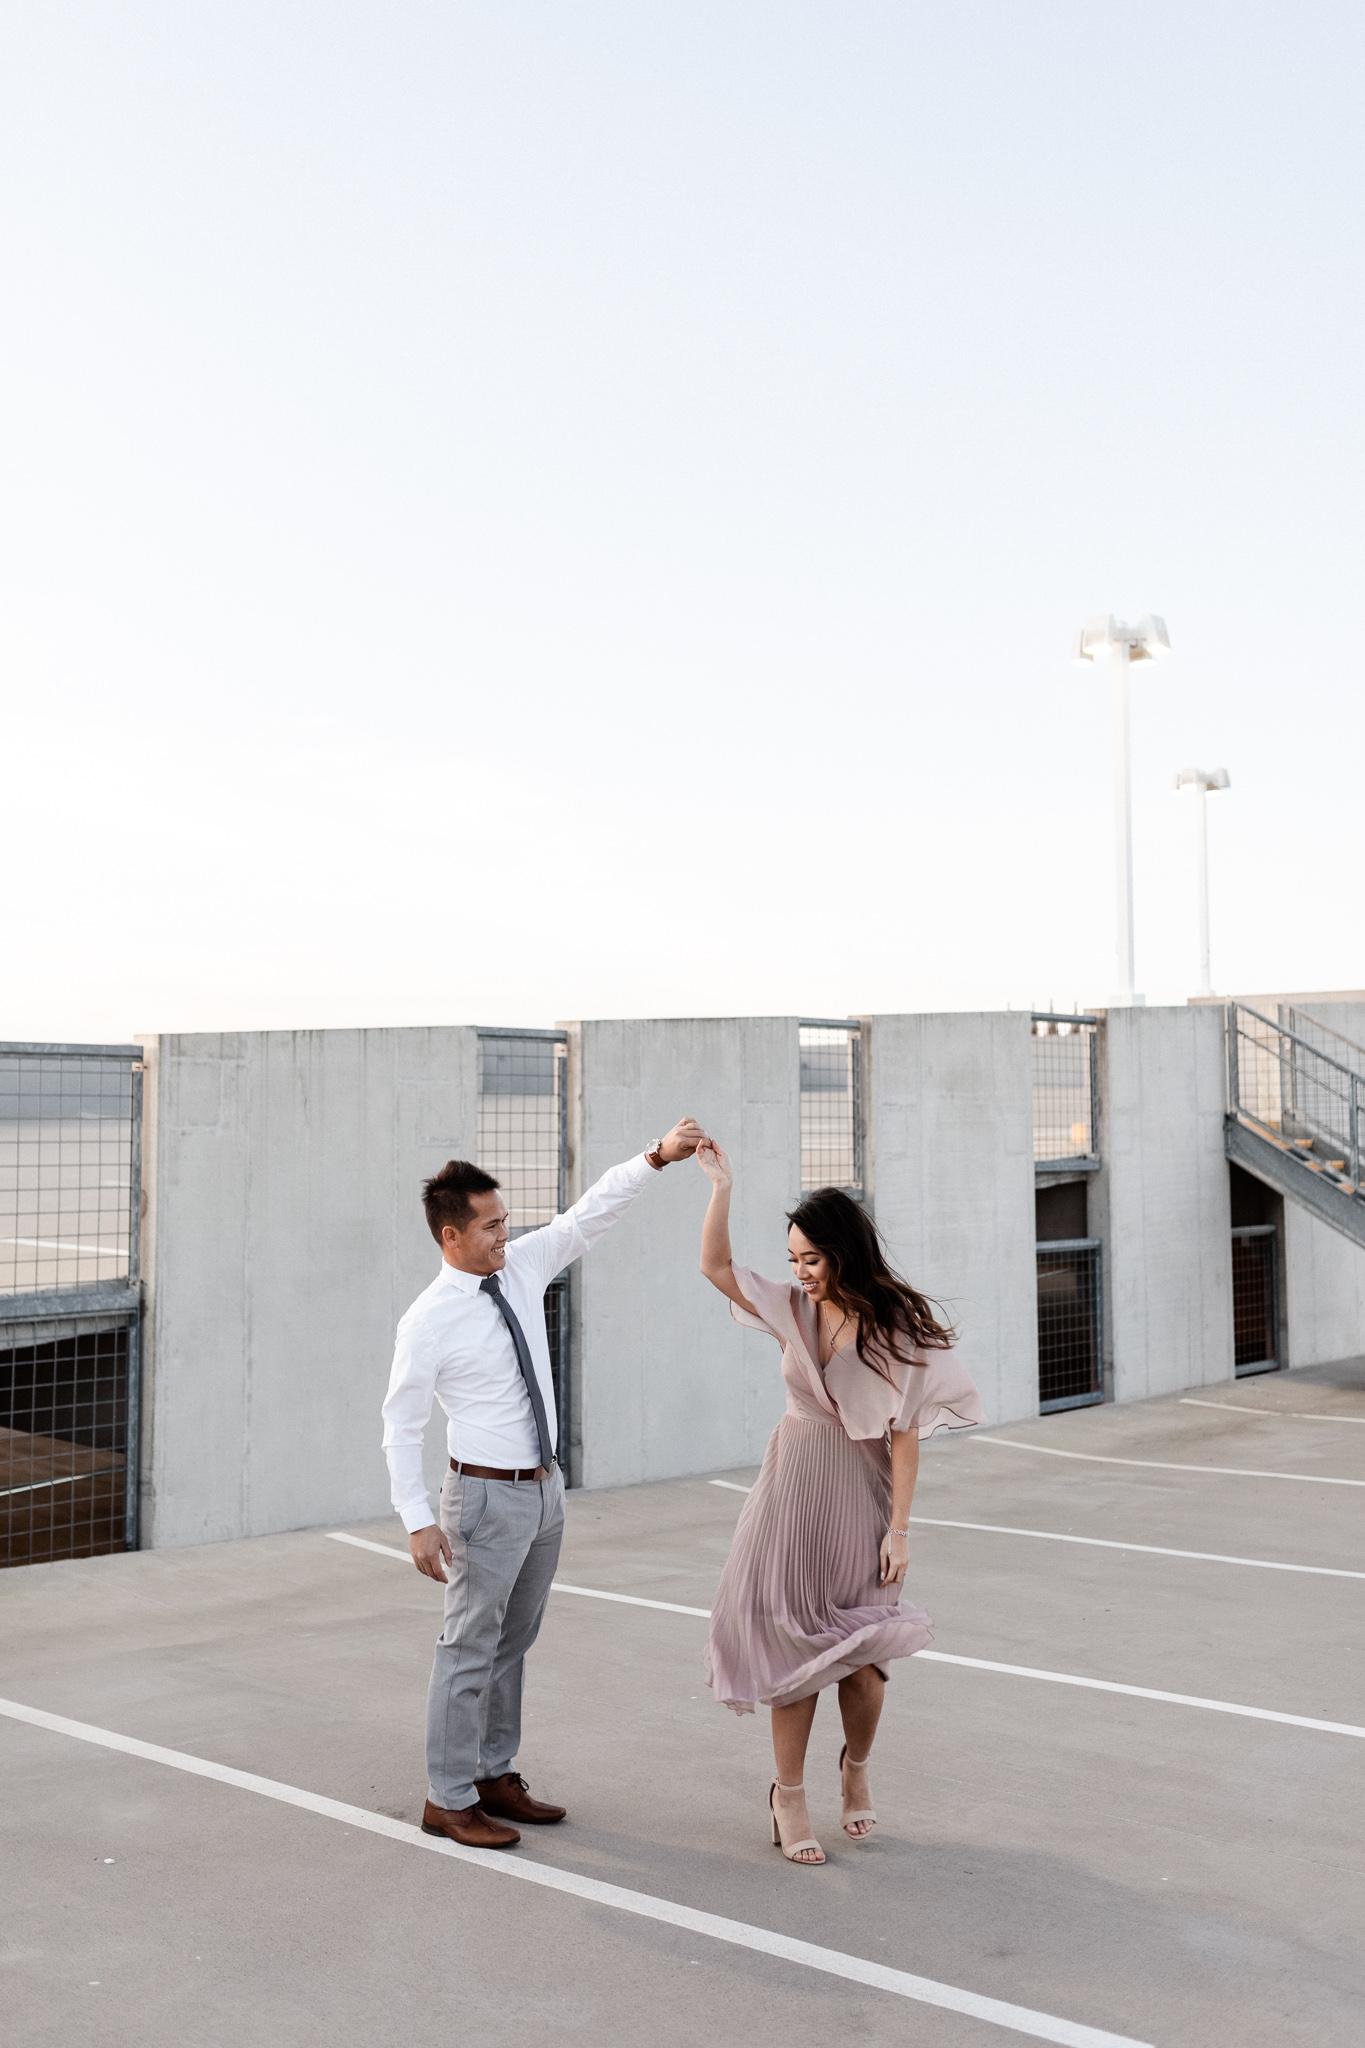 Hieu + Teresa | Colorful Romantic Downtown Engagements | Oklahoma Wedding Photographer-69.jpg